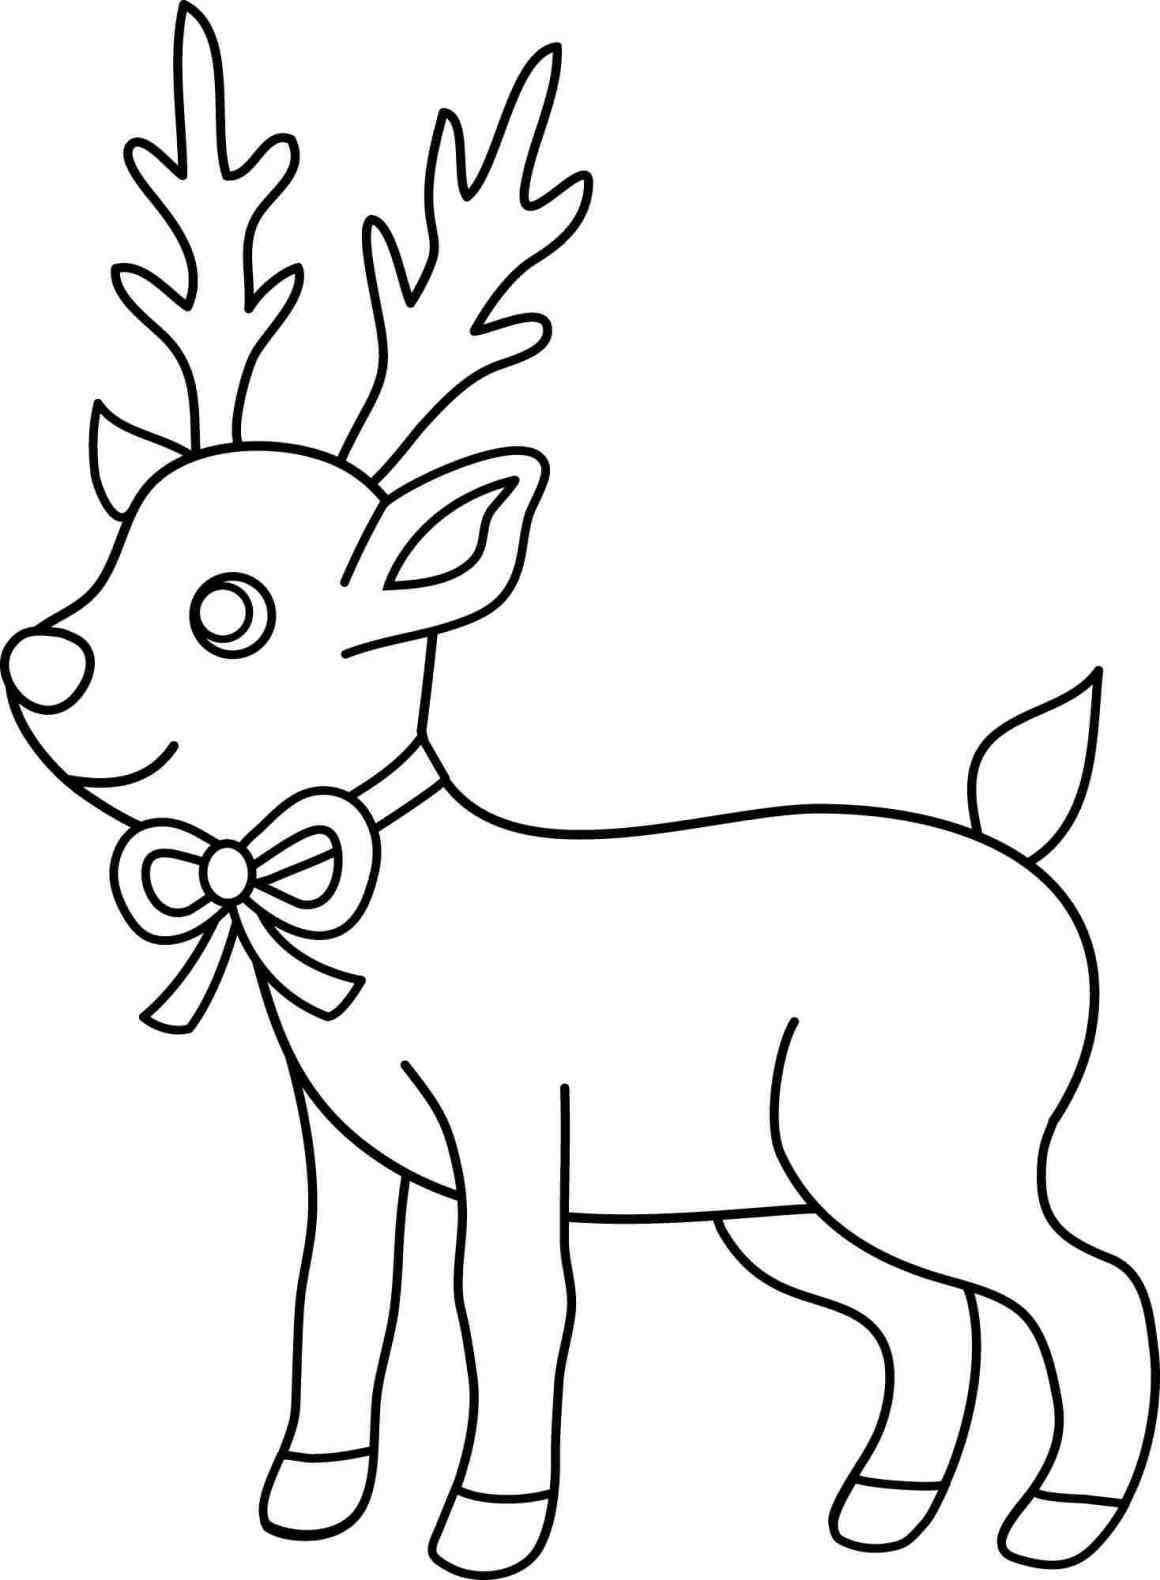 New Cool Christmas Reindeer Drawings At Temasistemi